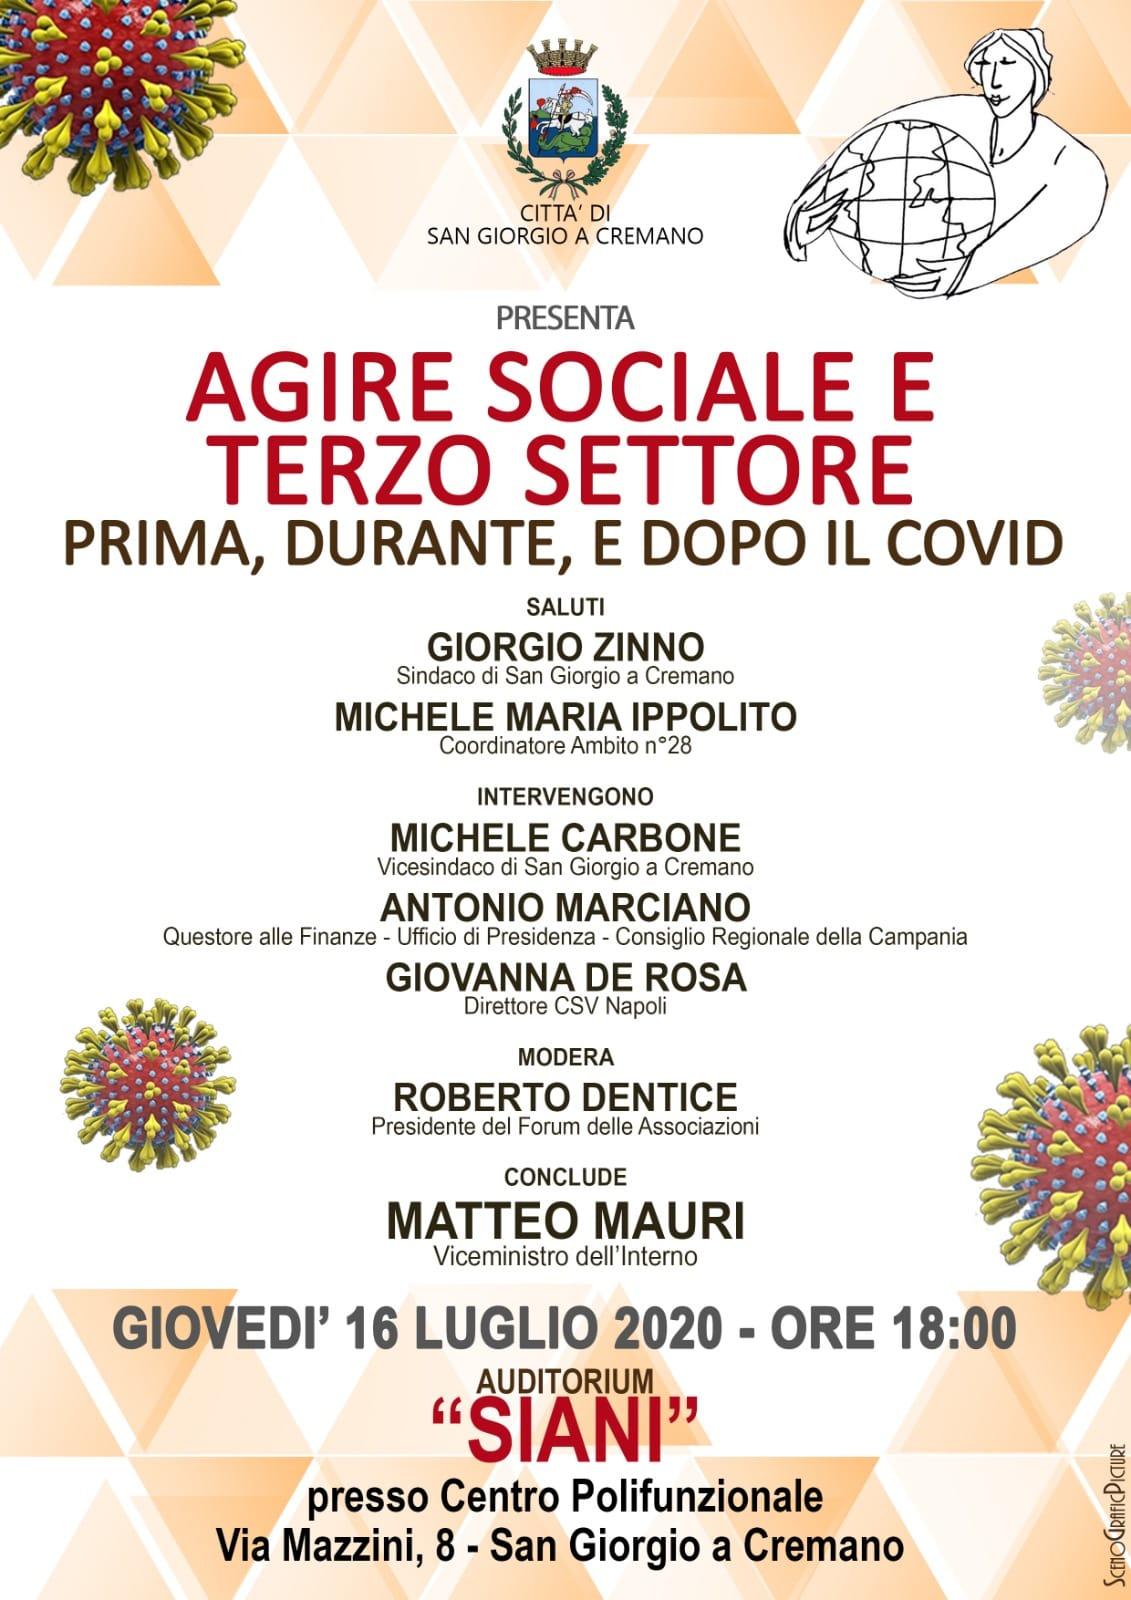 AGIRE SOCIALE SOTTOSEGRETARIO MAURI